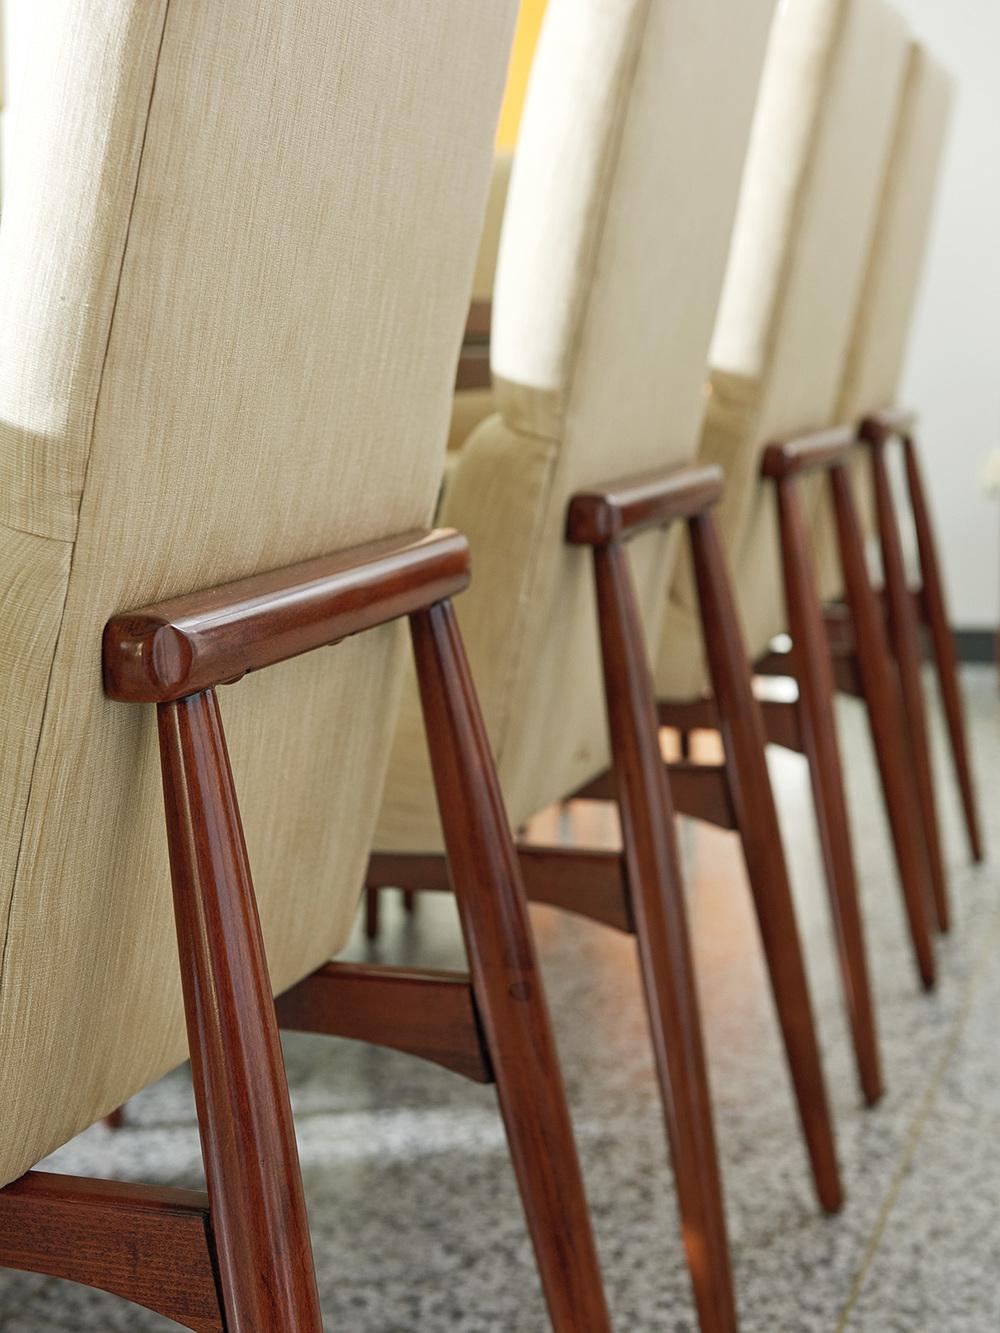 LEXINGTON HOME BRANDS - Chelsea Upholstered Side Chair